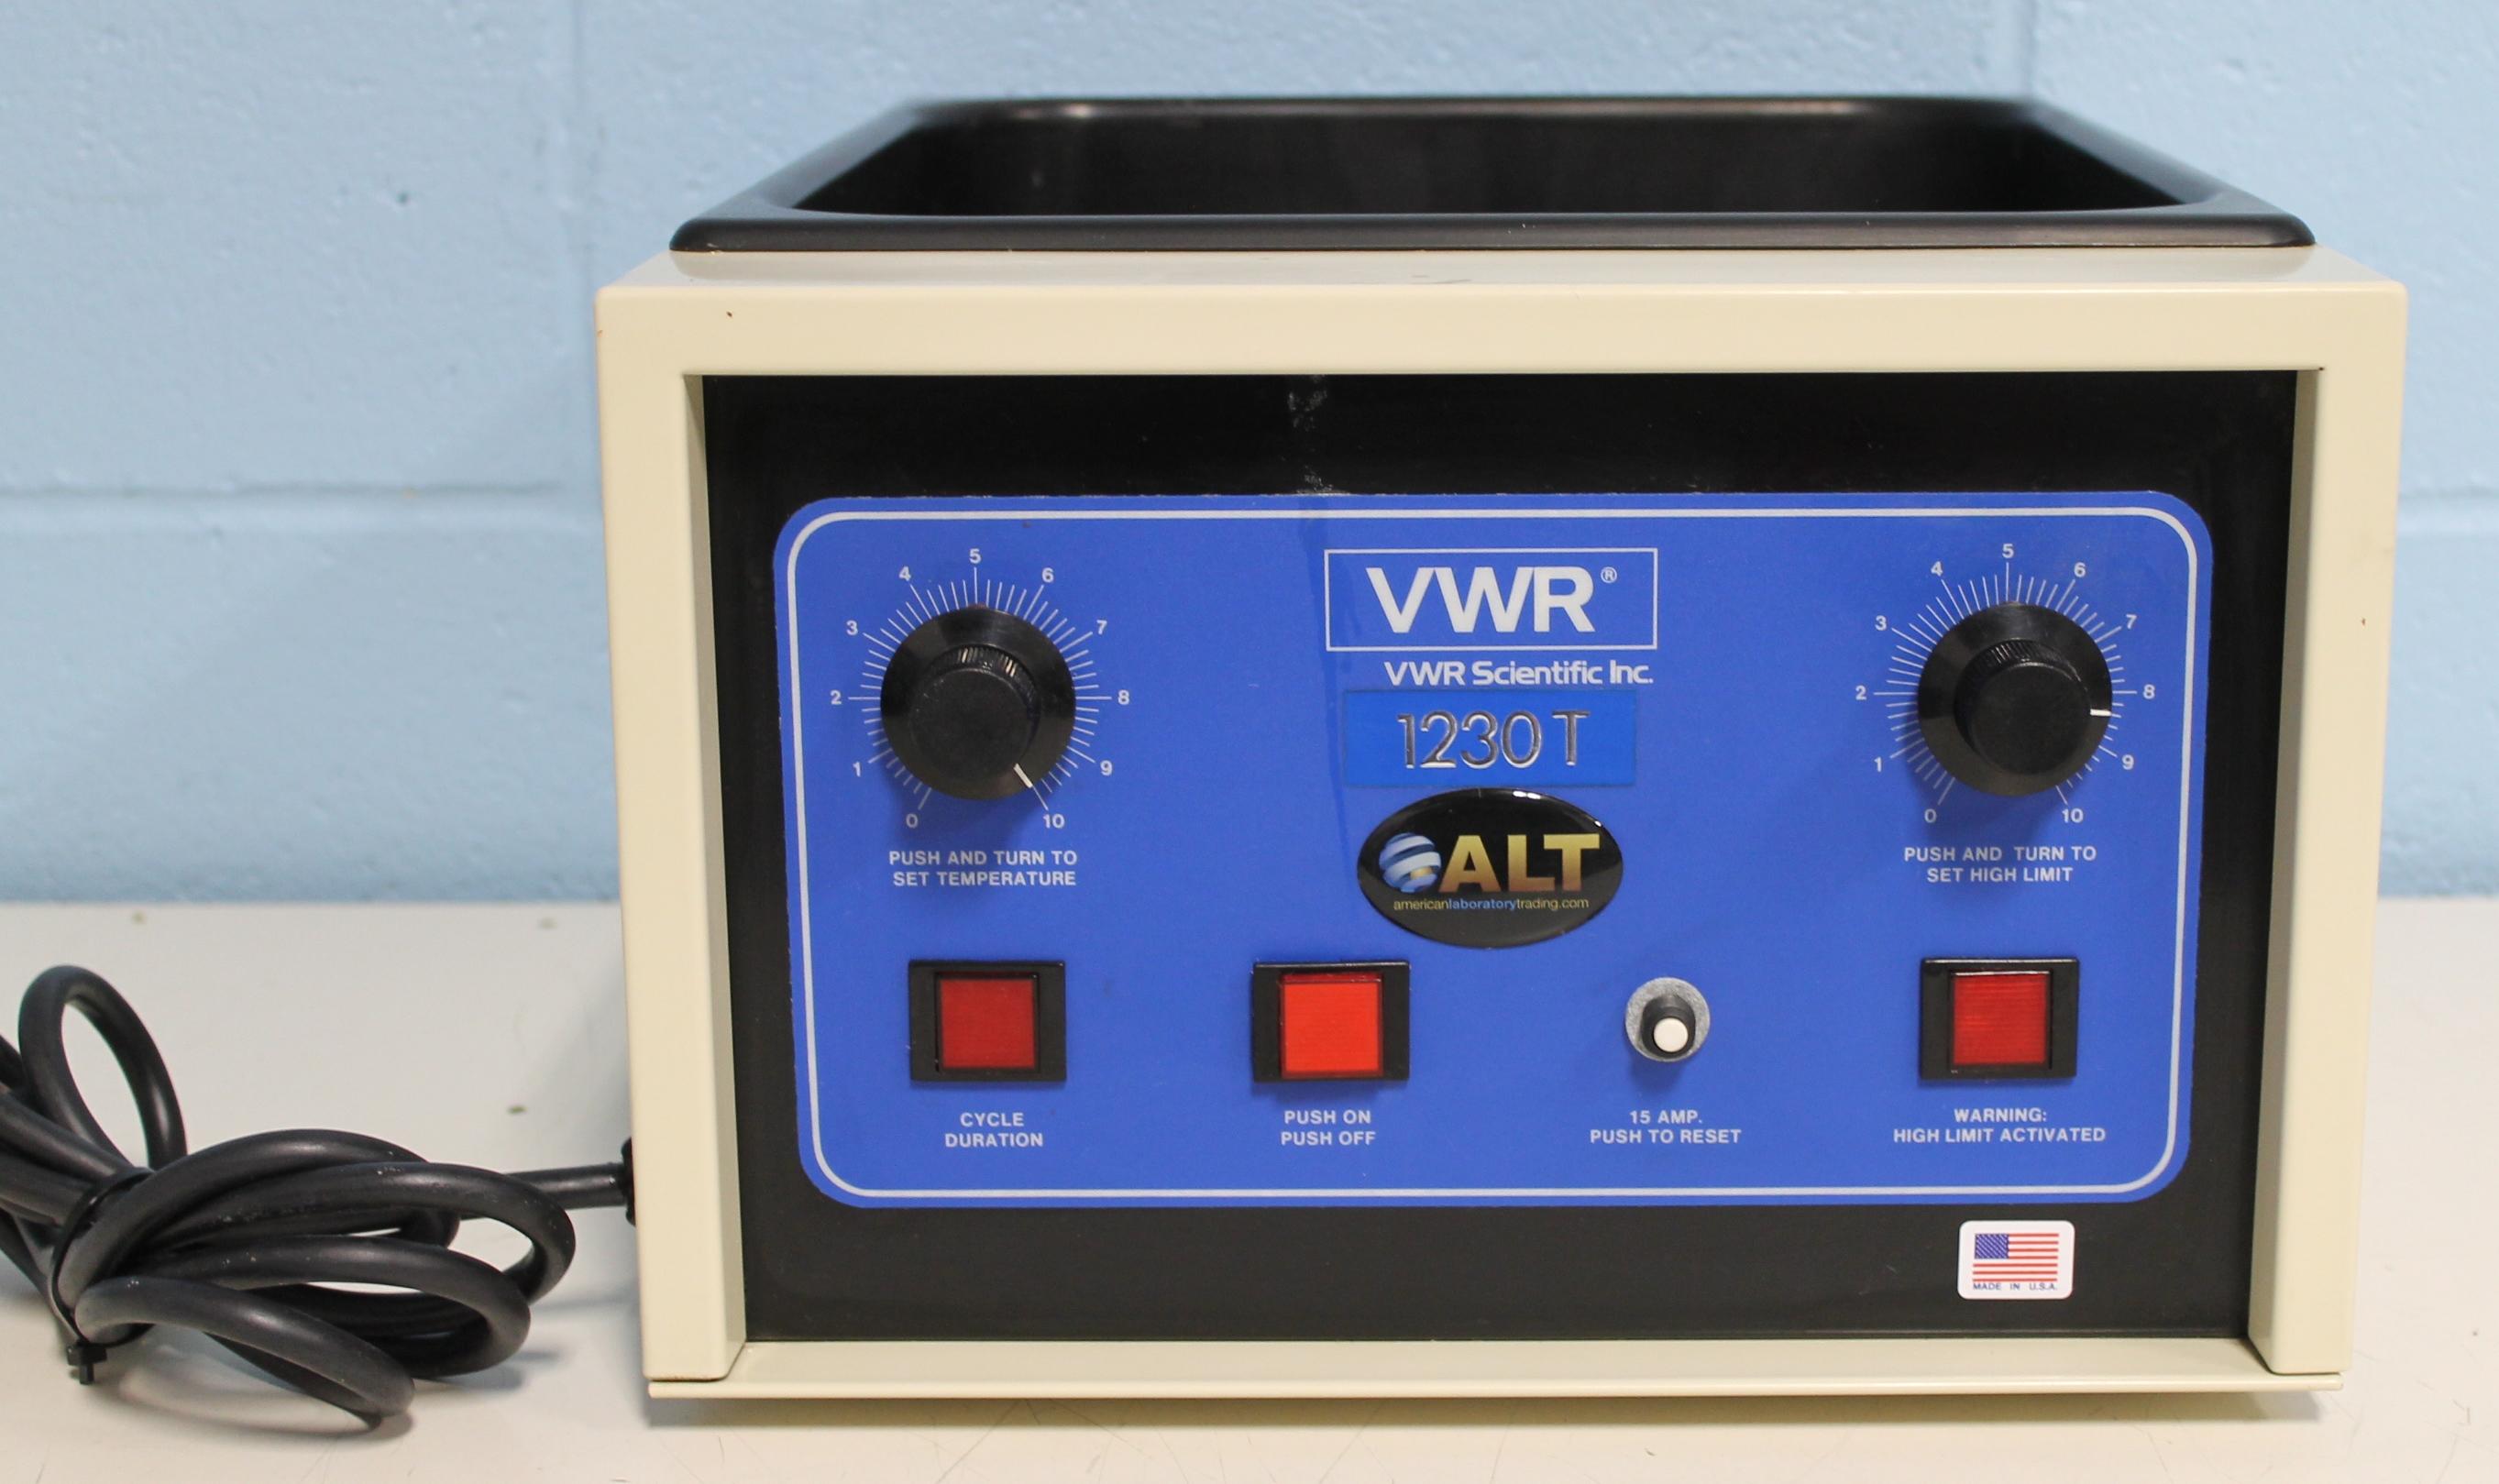 VWR 1230T Water Bath Image